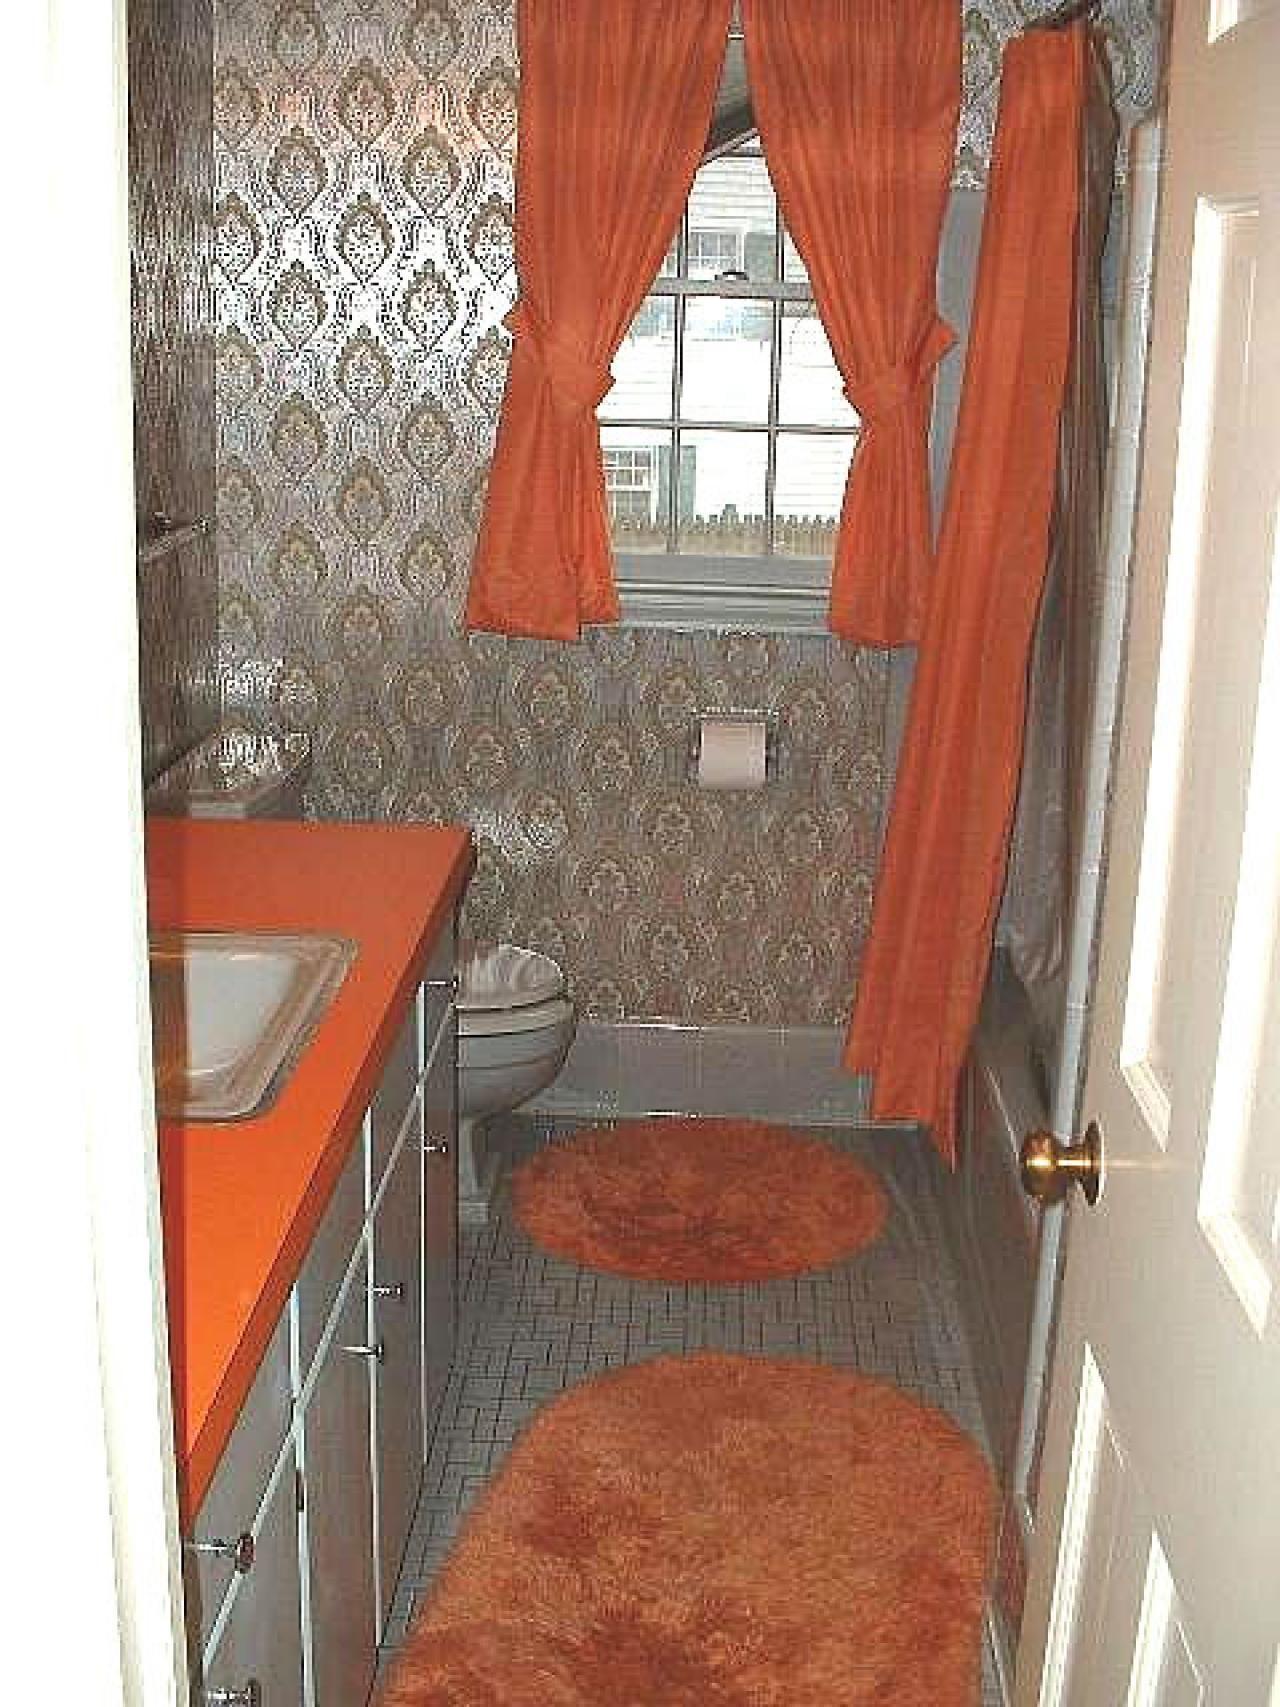 S Bathrooms